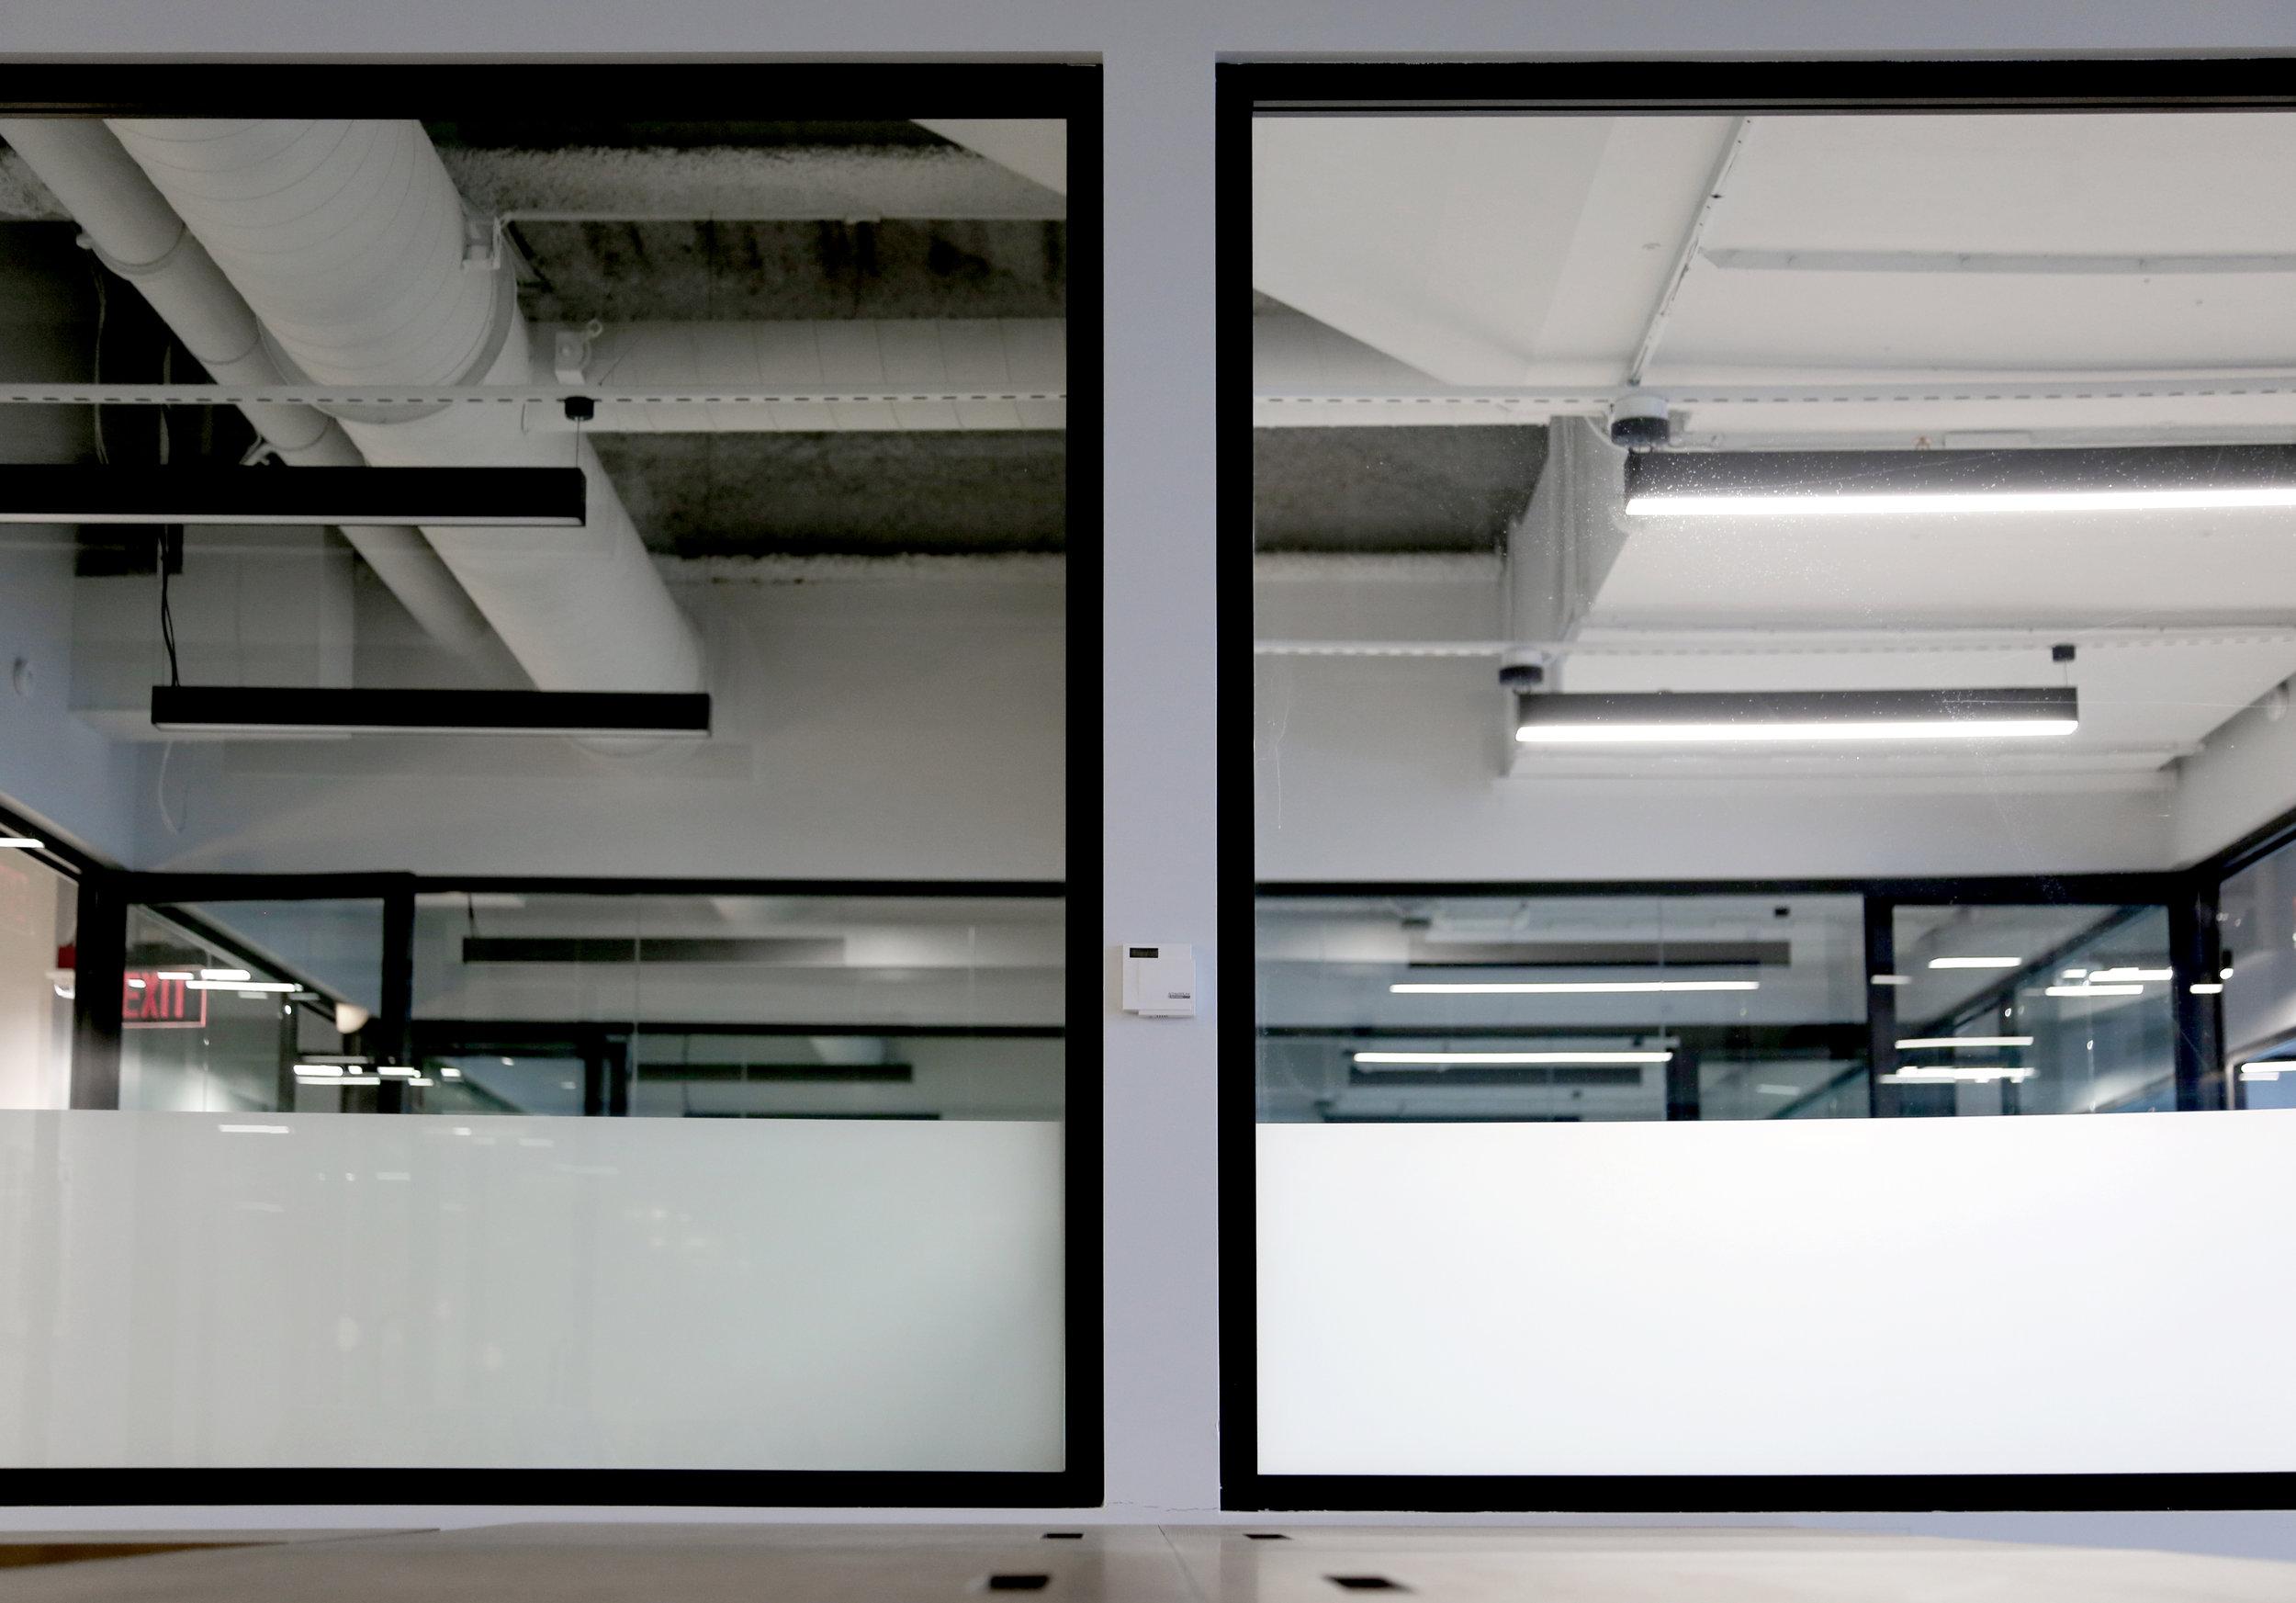 Litespace Black Framed Aluminum System Windows - Spaceworks AI.jpg